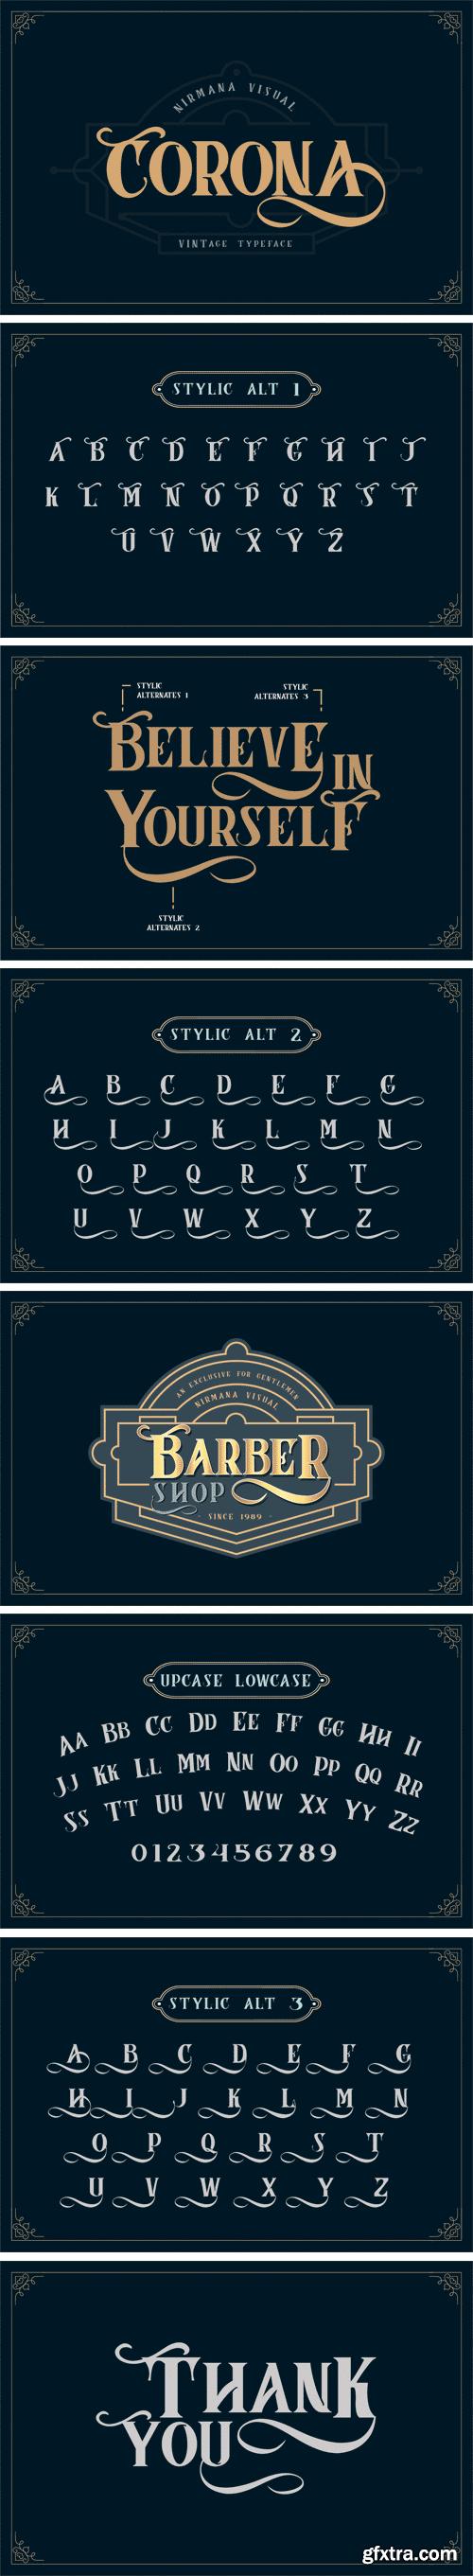 Fontbundles - Corona Vintage Typeface 179120